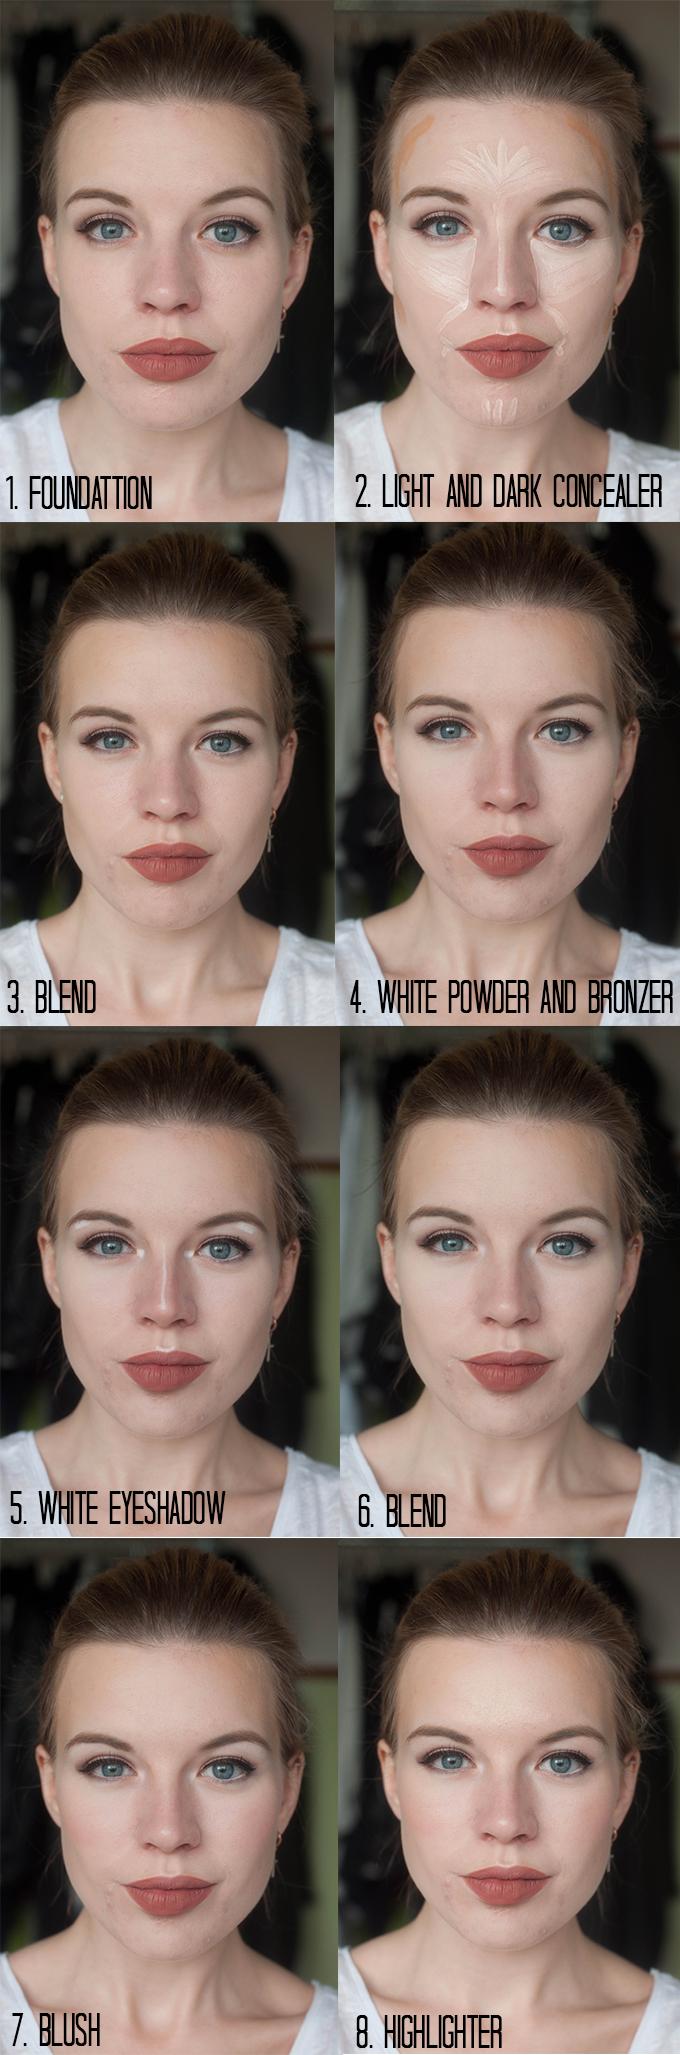 RED REIDING HOOD: Blogger beauty hack concealer contouring tutorial contour like a pro MUA kim kardashian make up instructions how to